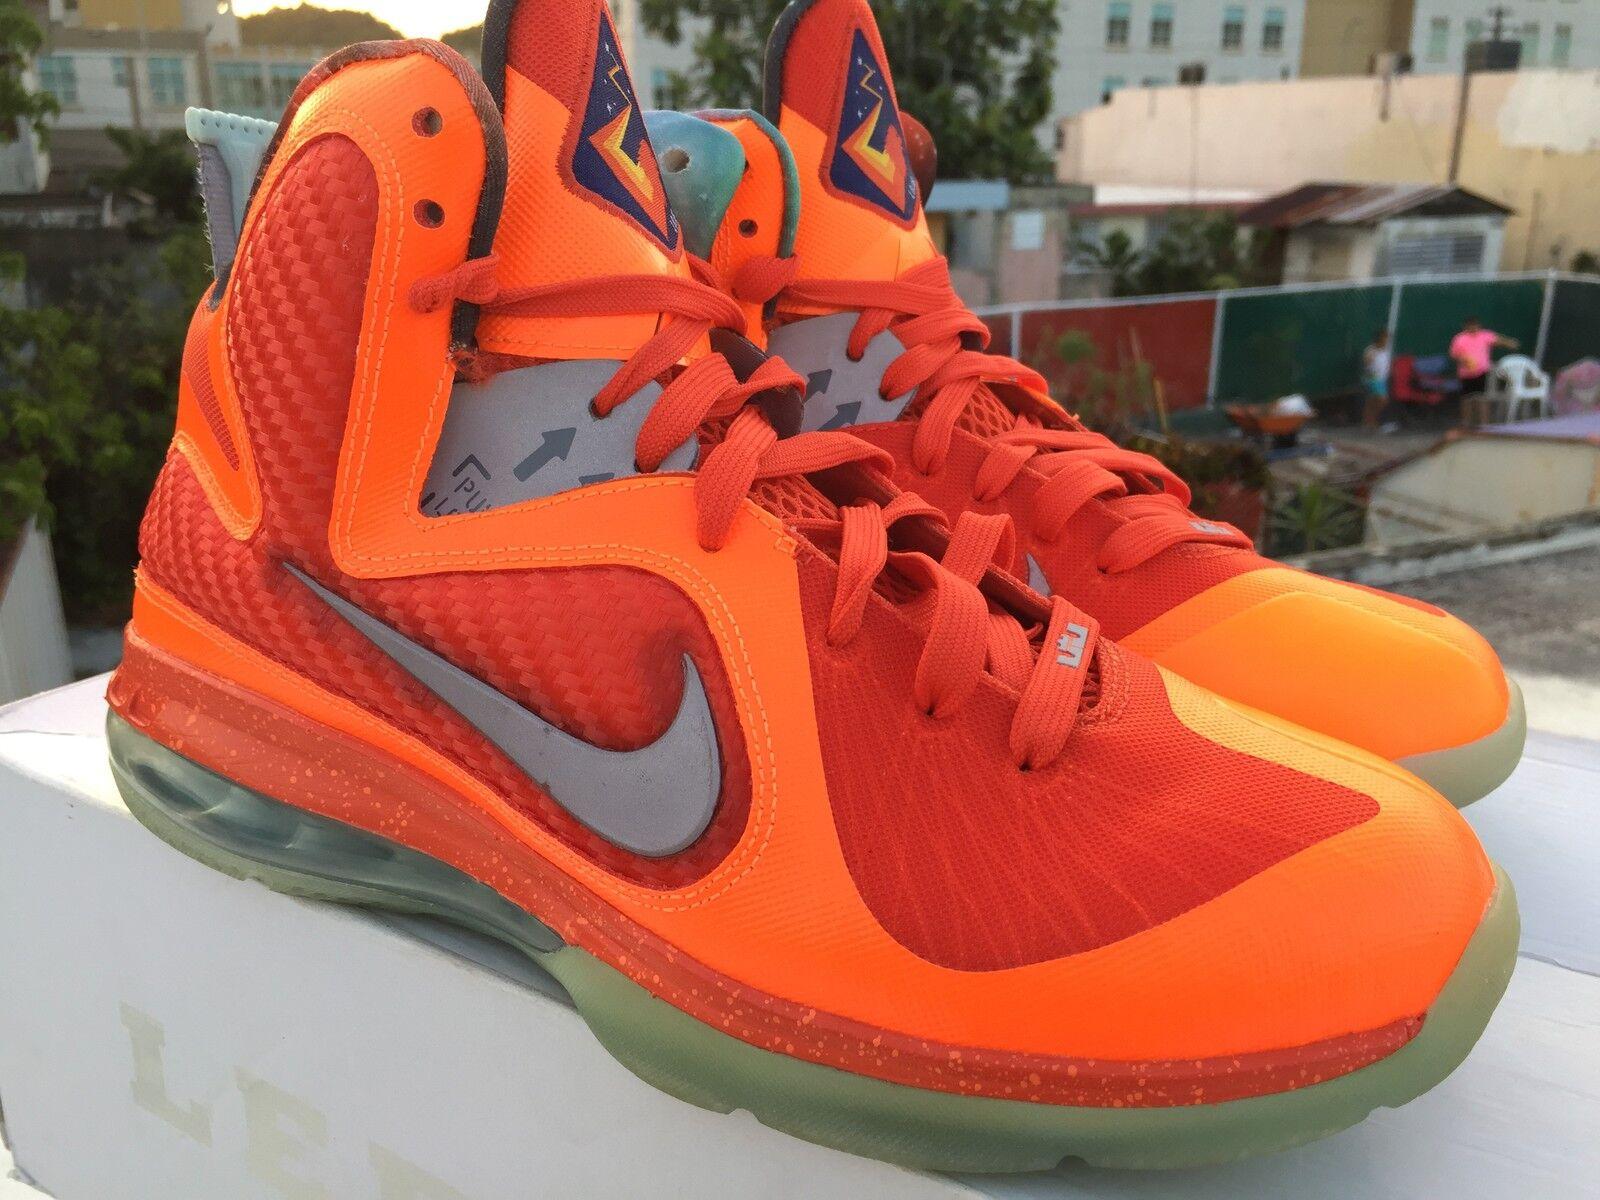 Nike Air Lebron 9 All-Star Galaxy SZ 9 520811-800 2012 Release